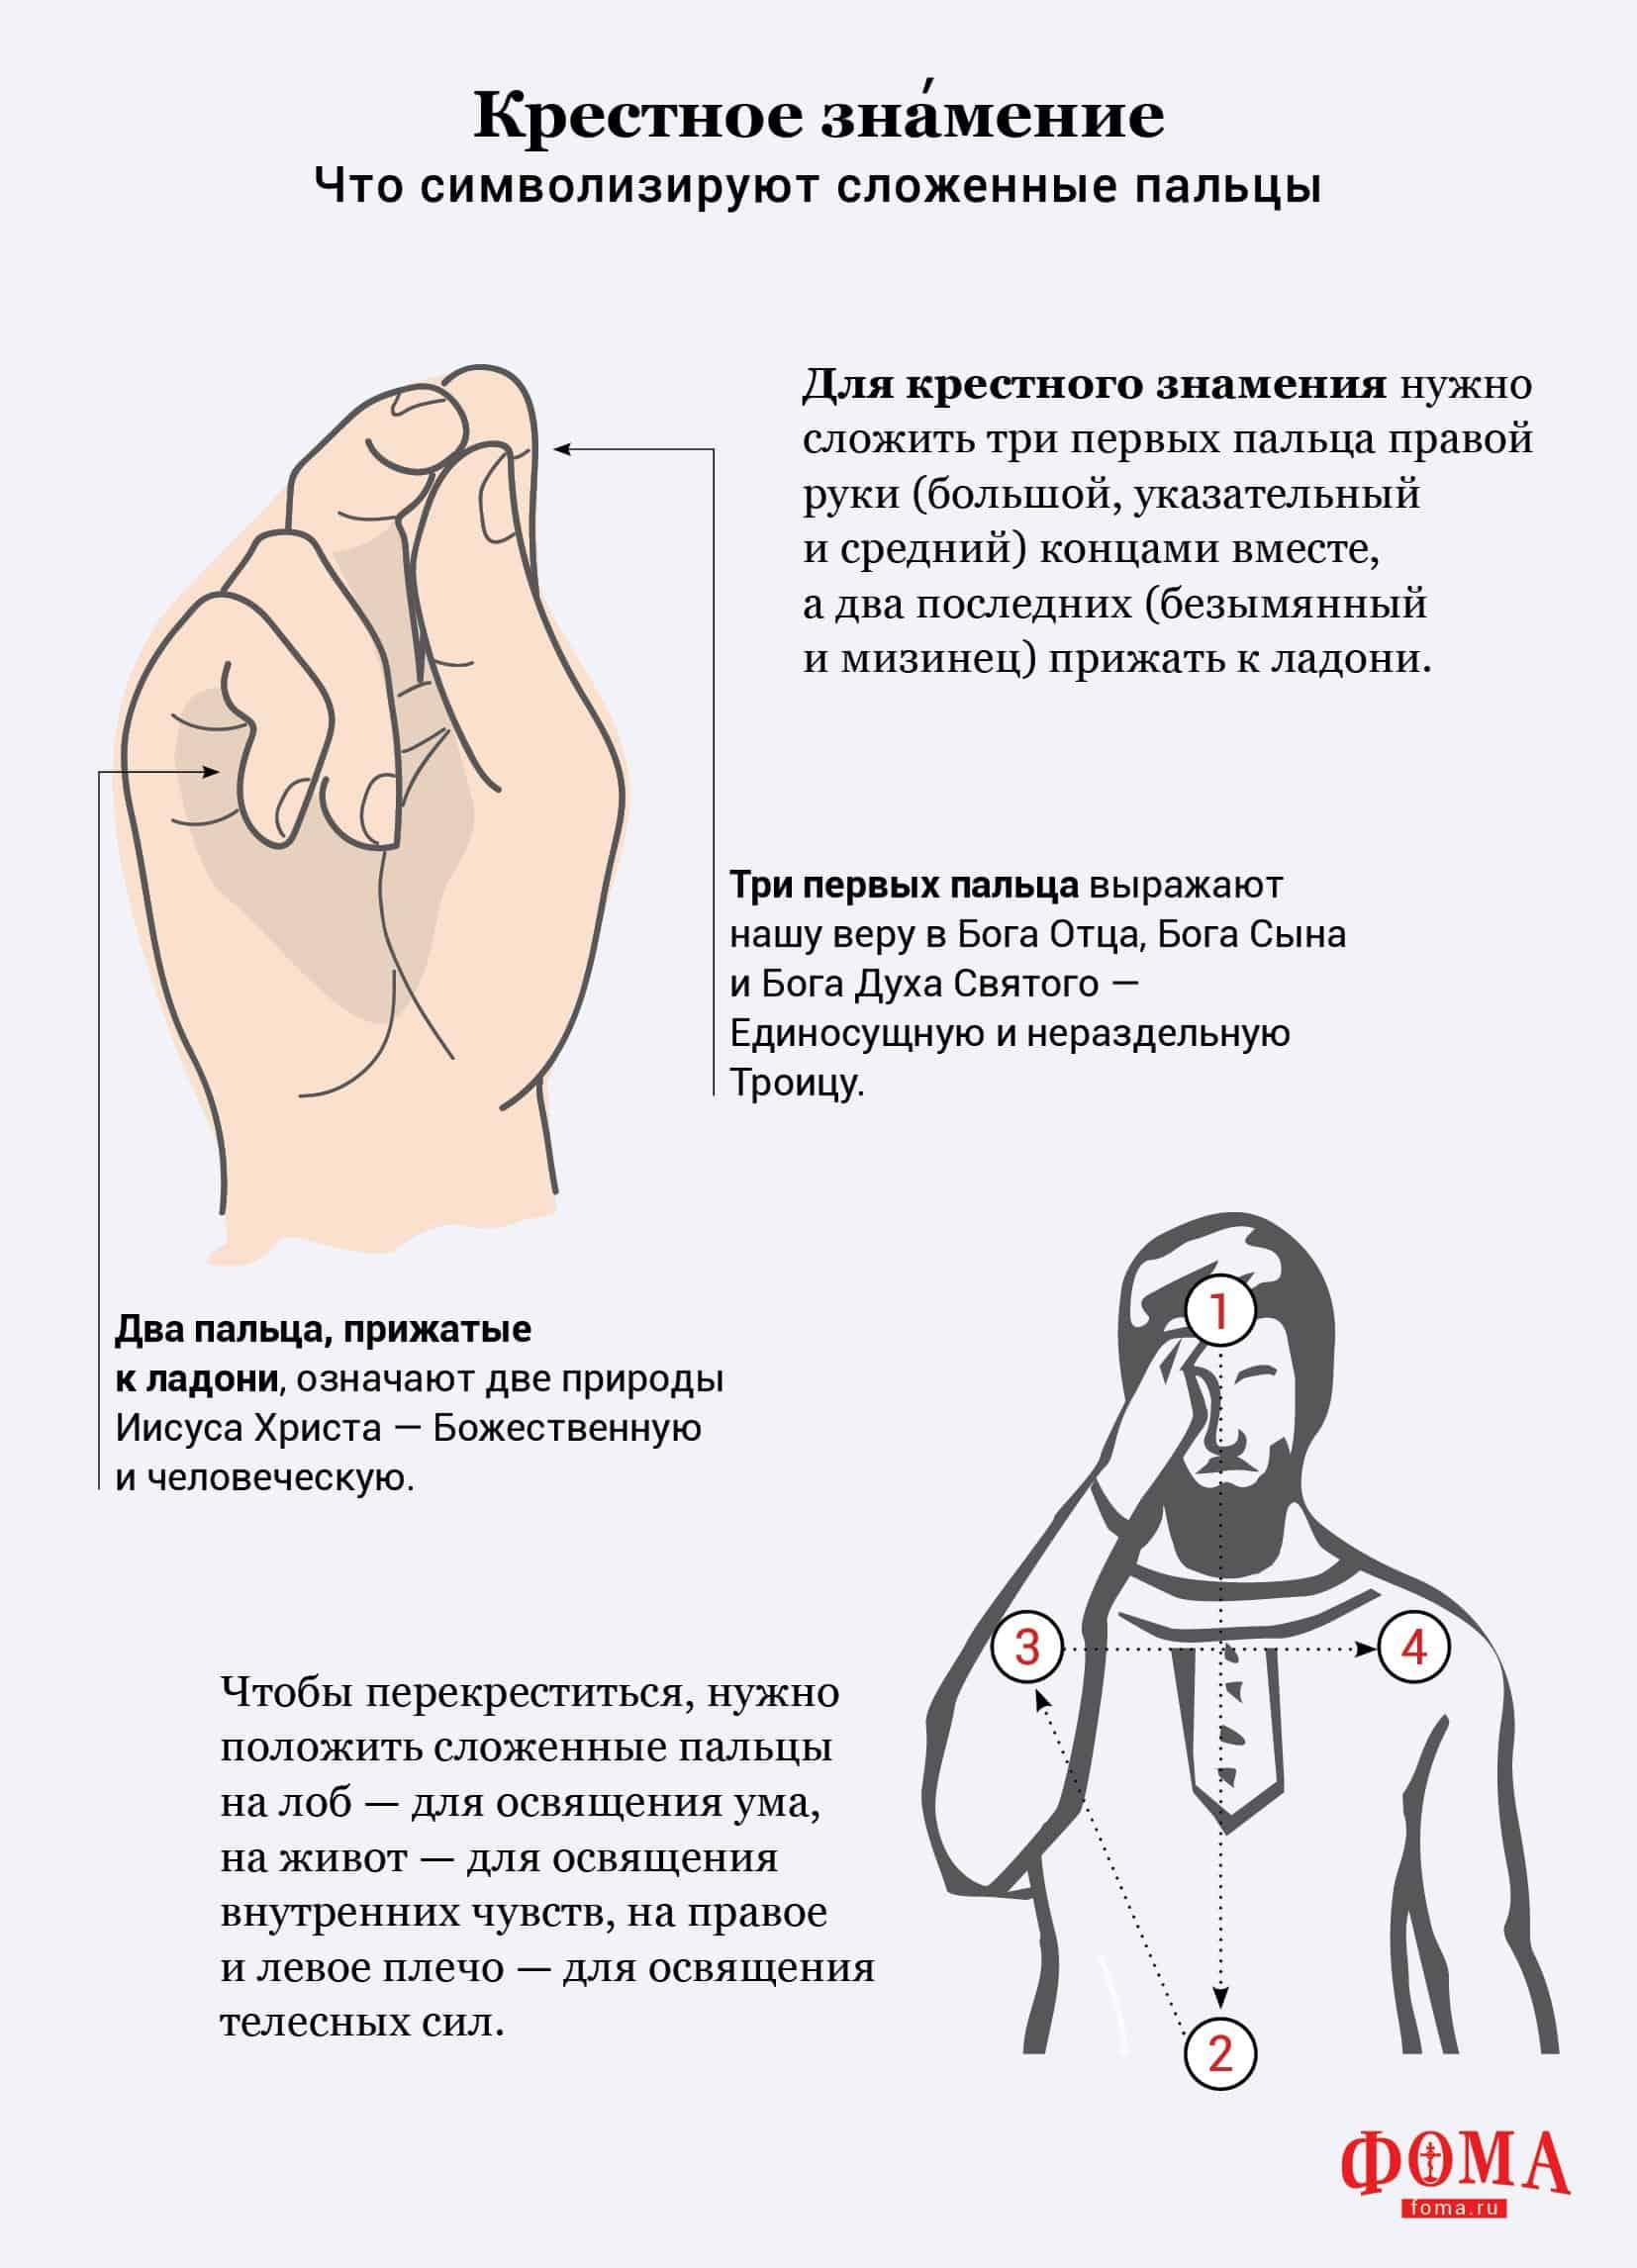 https://foma.ru/wp-content/uploads/2017/03/Krestnoe_znamenie_info_L.jpg